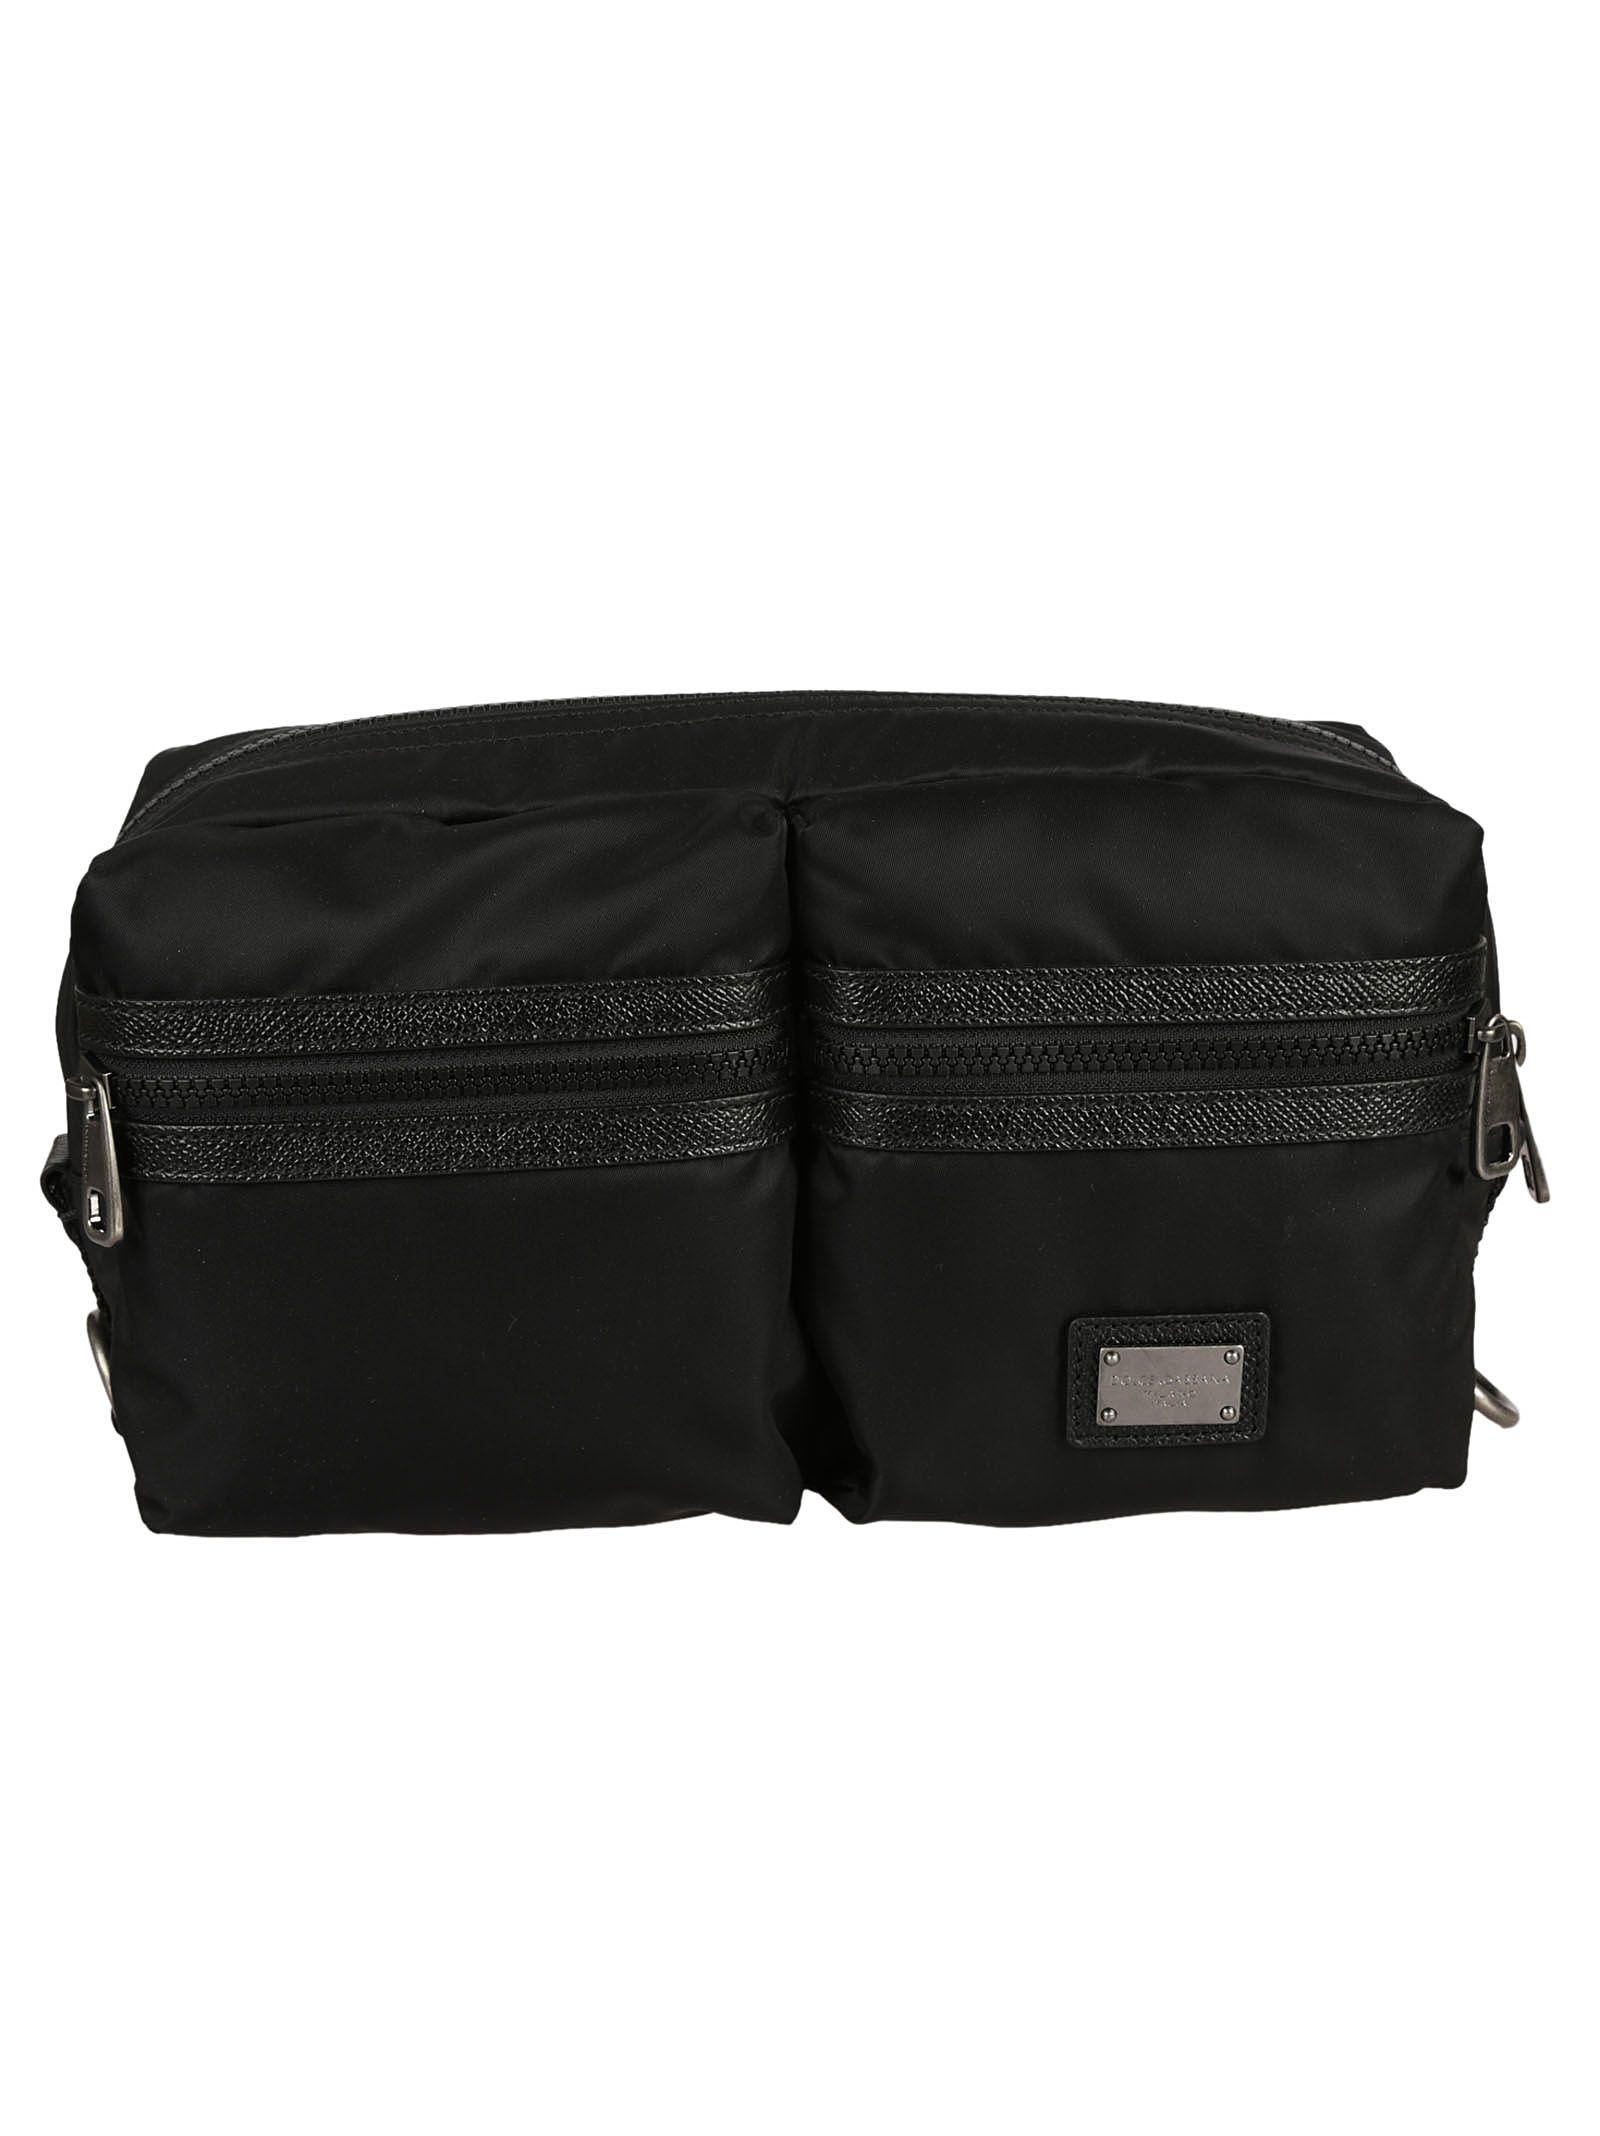 04d9ddd1058b Dolce   Gabbana Dolce   Gabbana Double Compartment Bumbag - Black ...